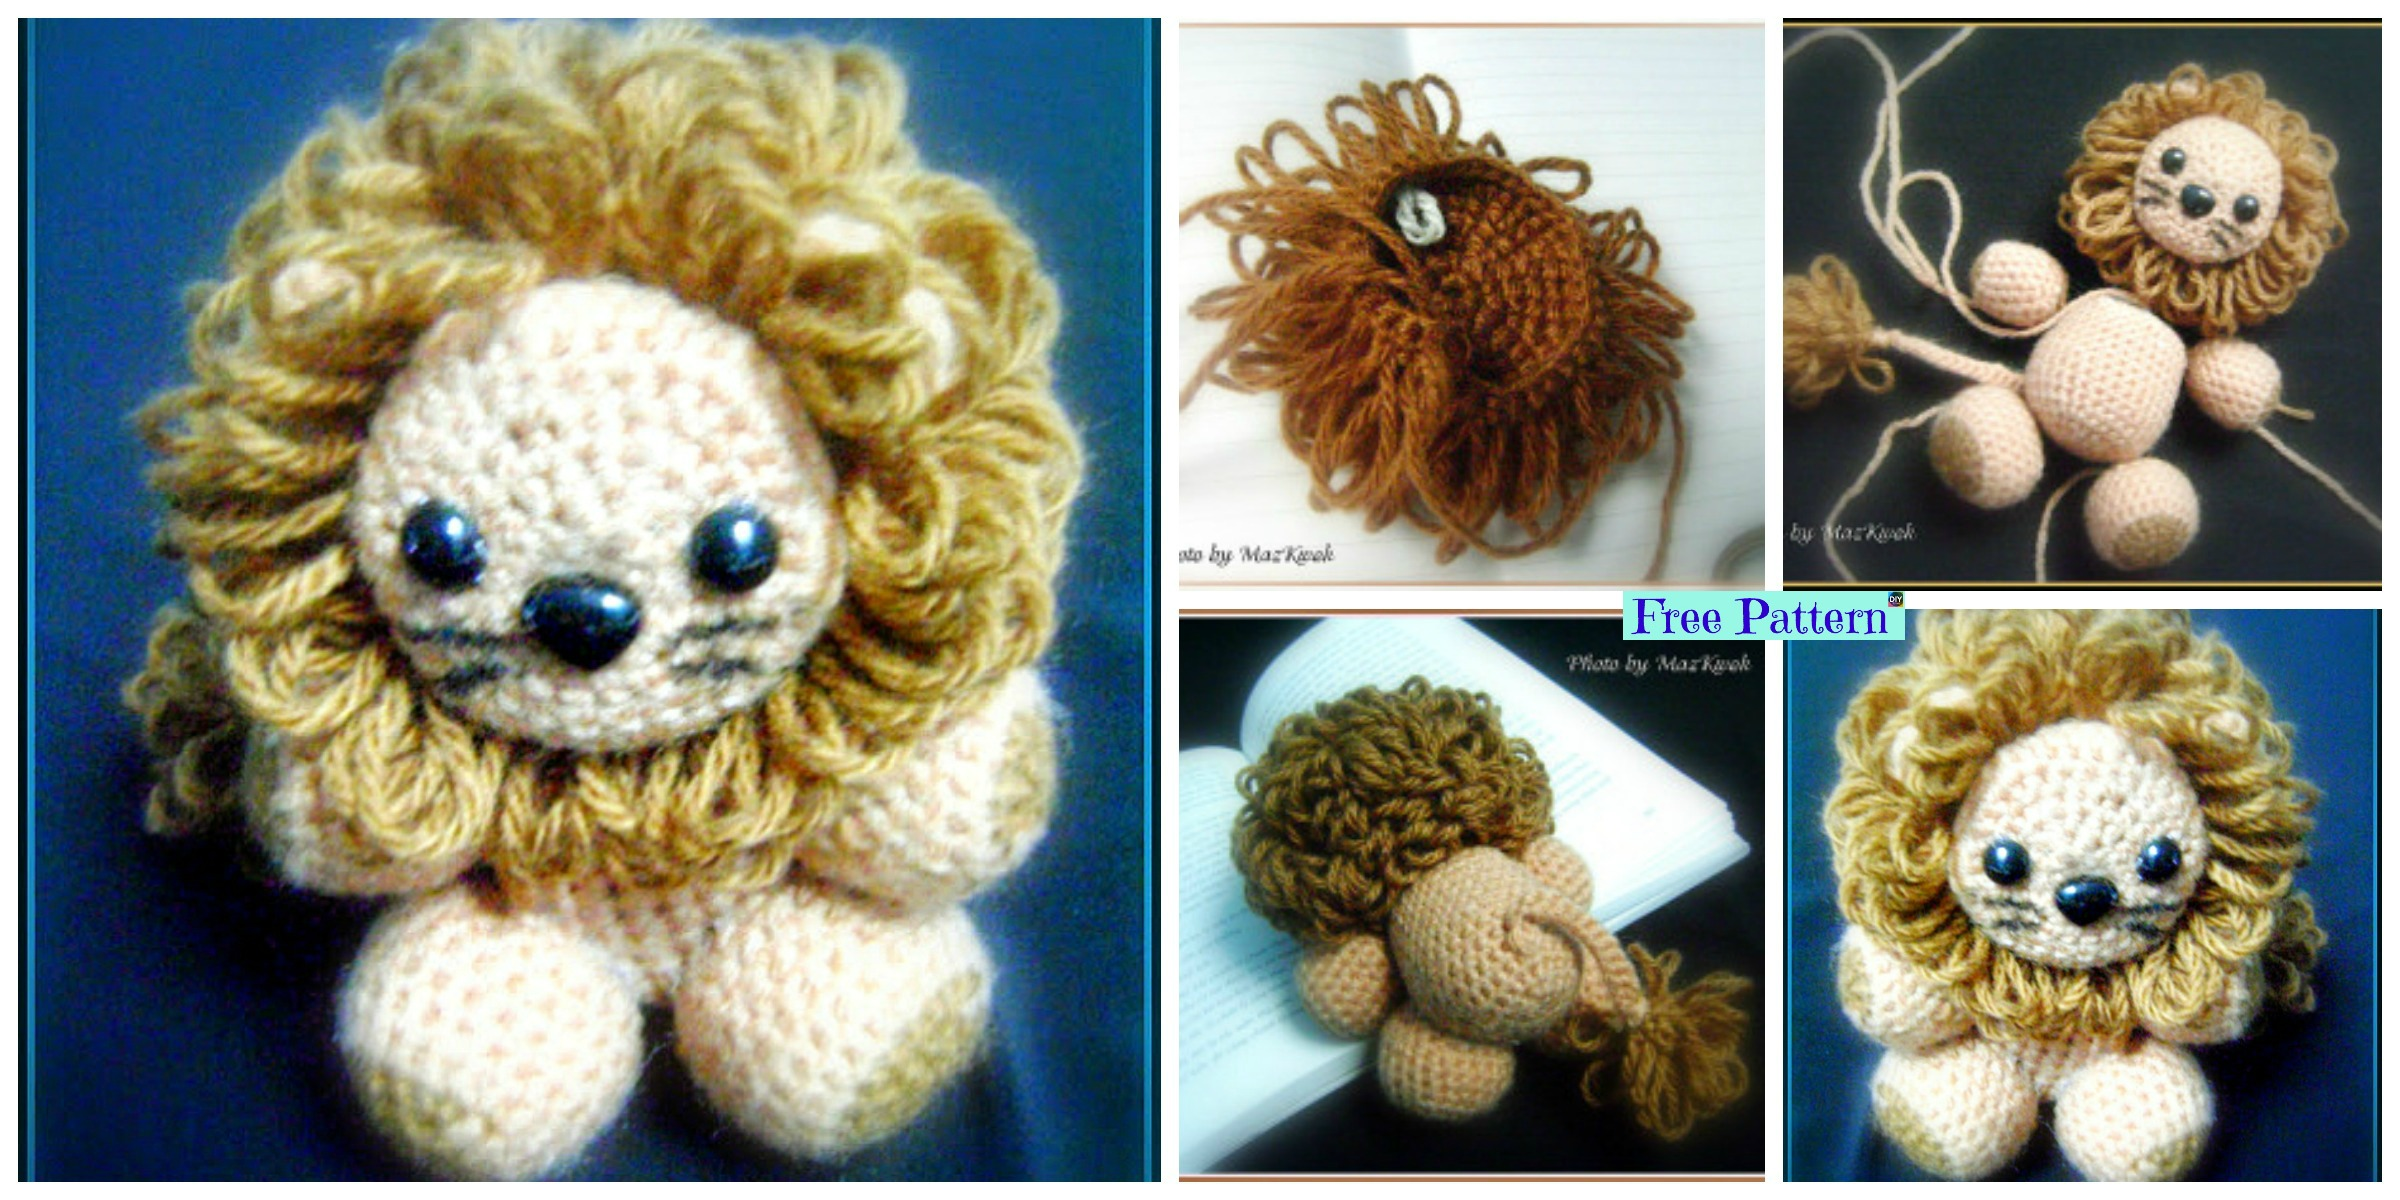 Crochet Lion Amigurumi Patterns – Best & Free DIY Projects | Made ... | 1200x2400